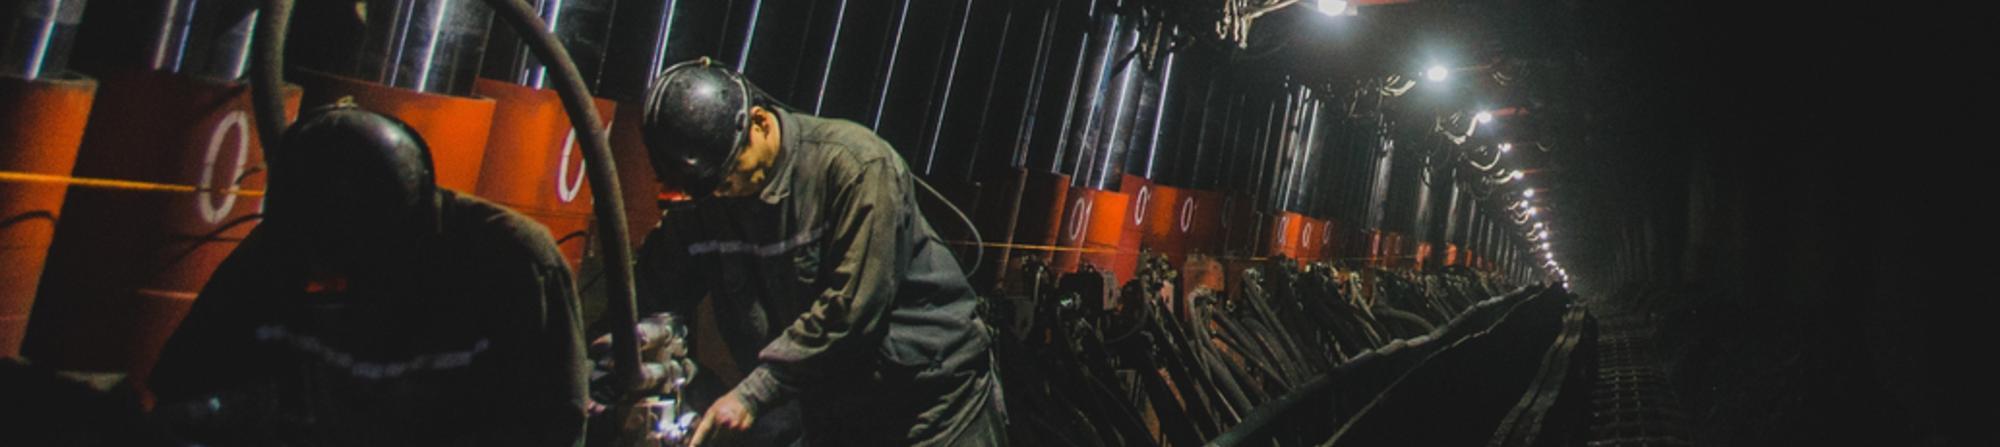 Underground Coal